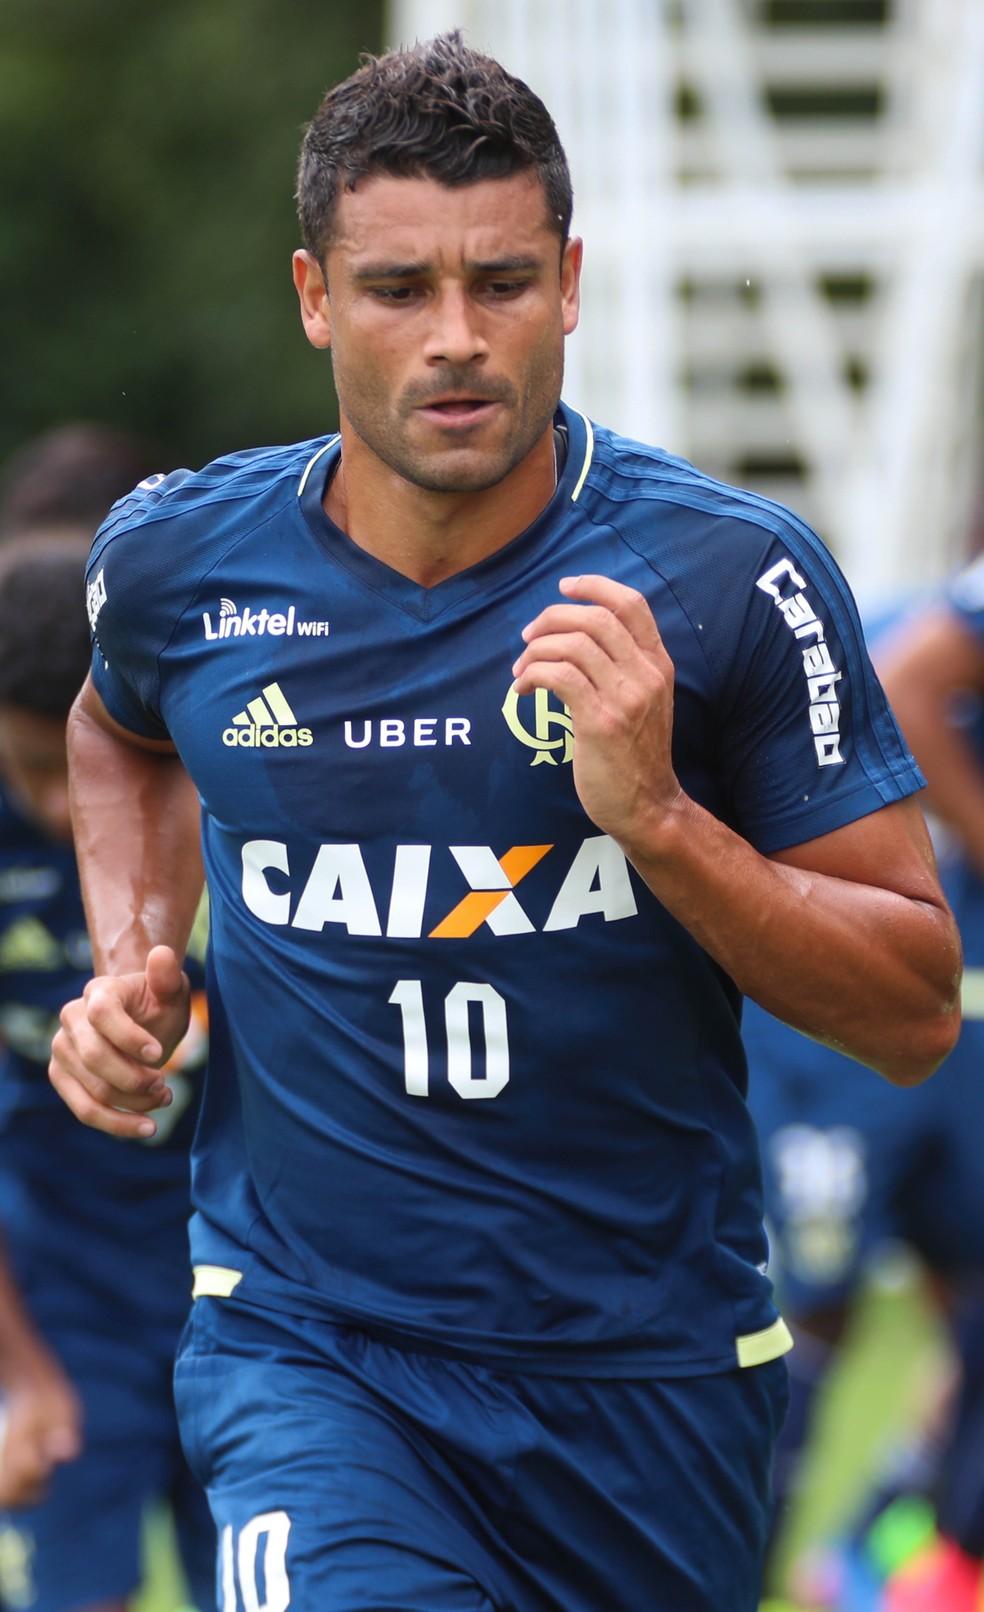 Ederson corre para conseguir chance no Flamengo (Foto: Gilvan de Souza/Flamengo)